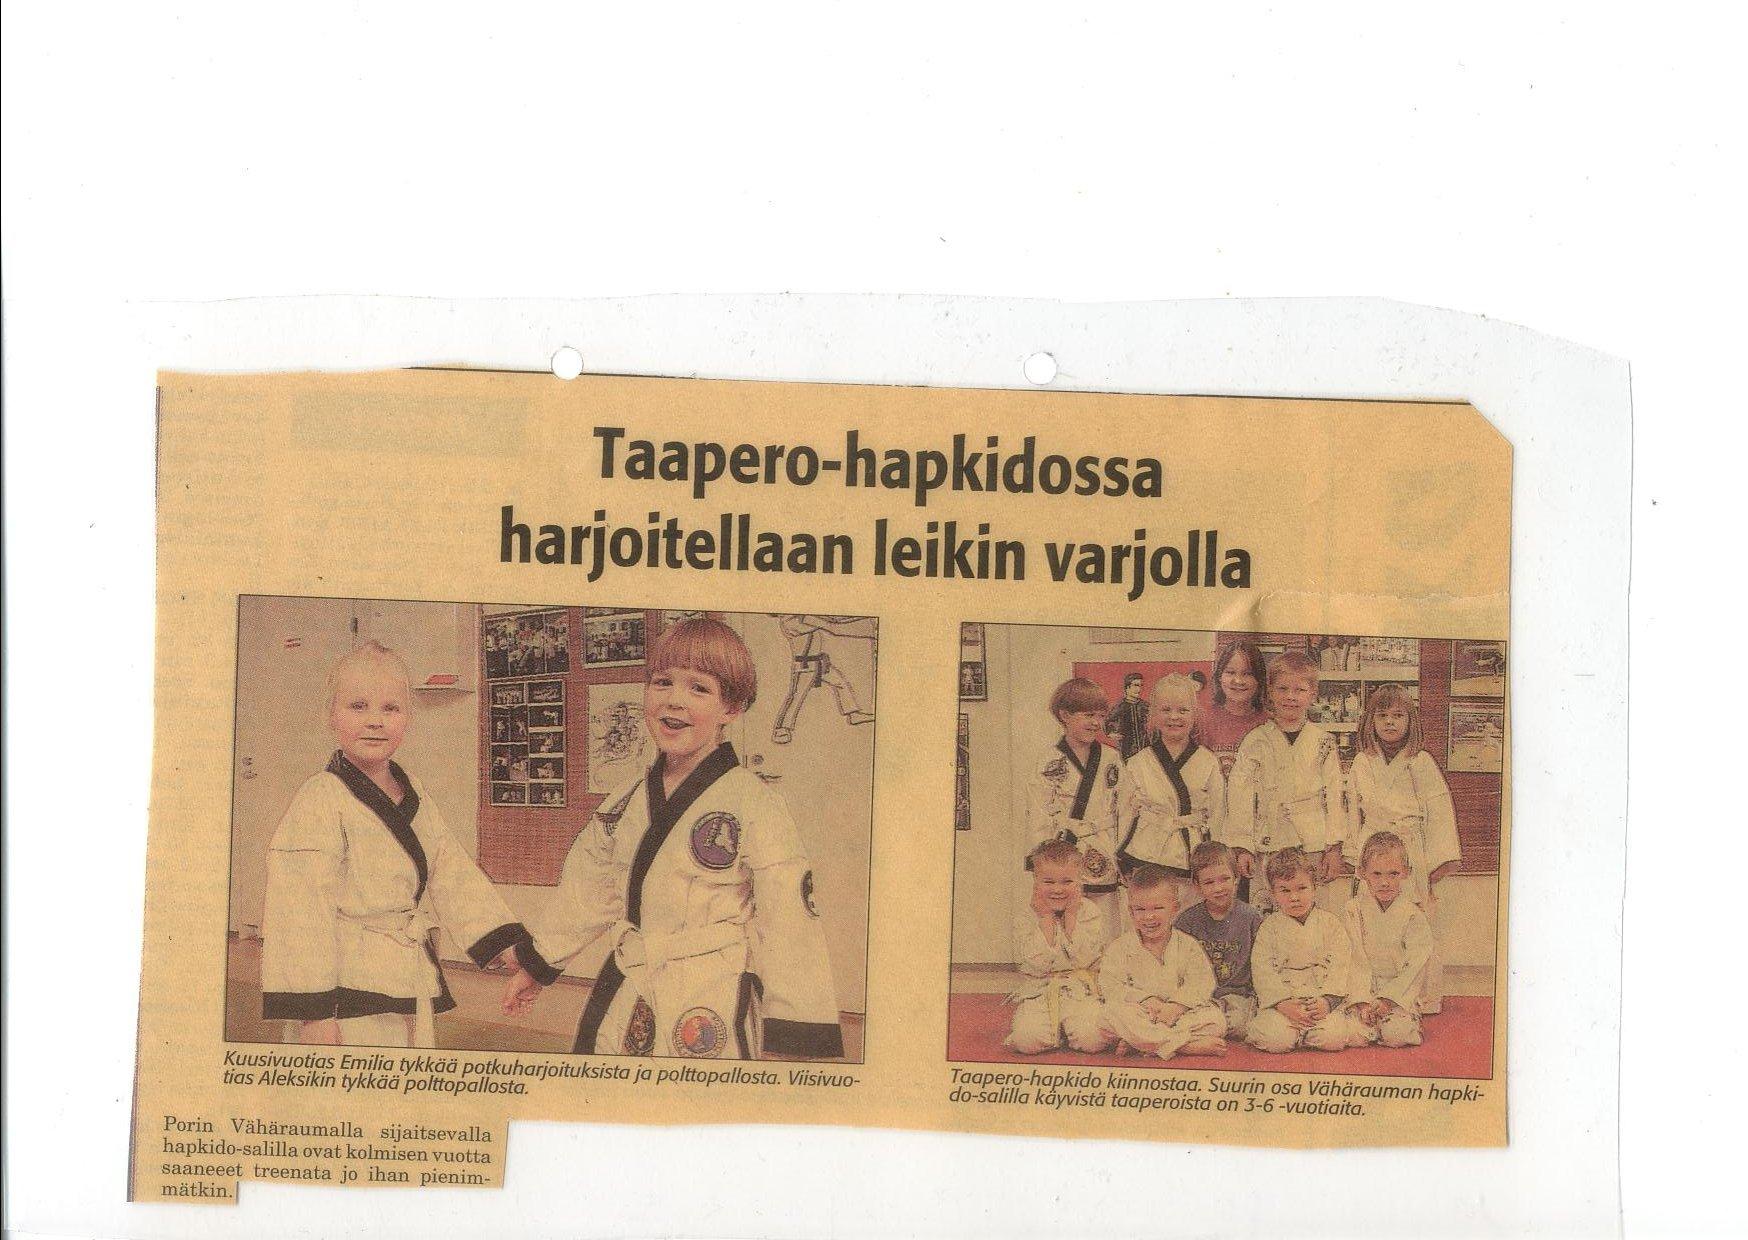 Taapero